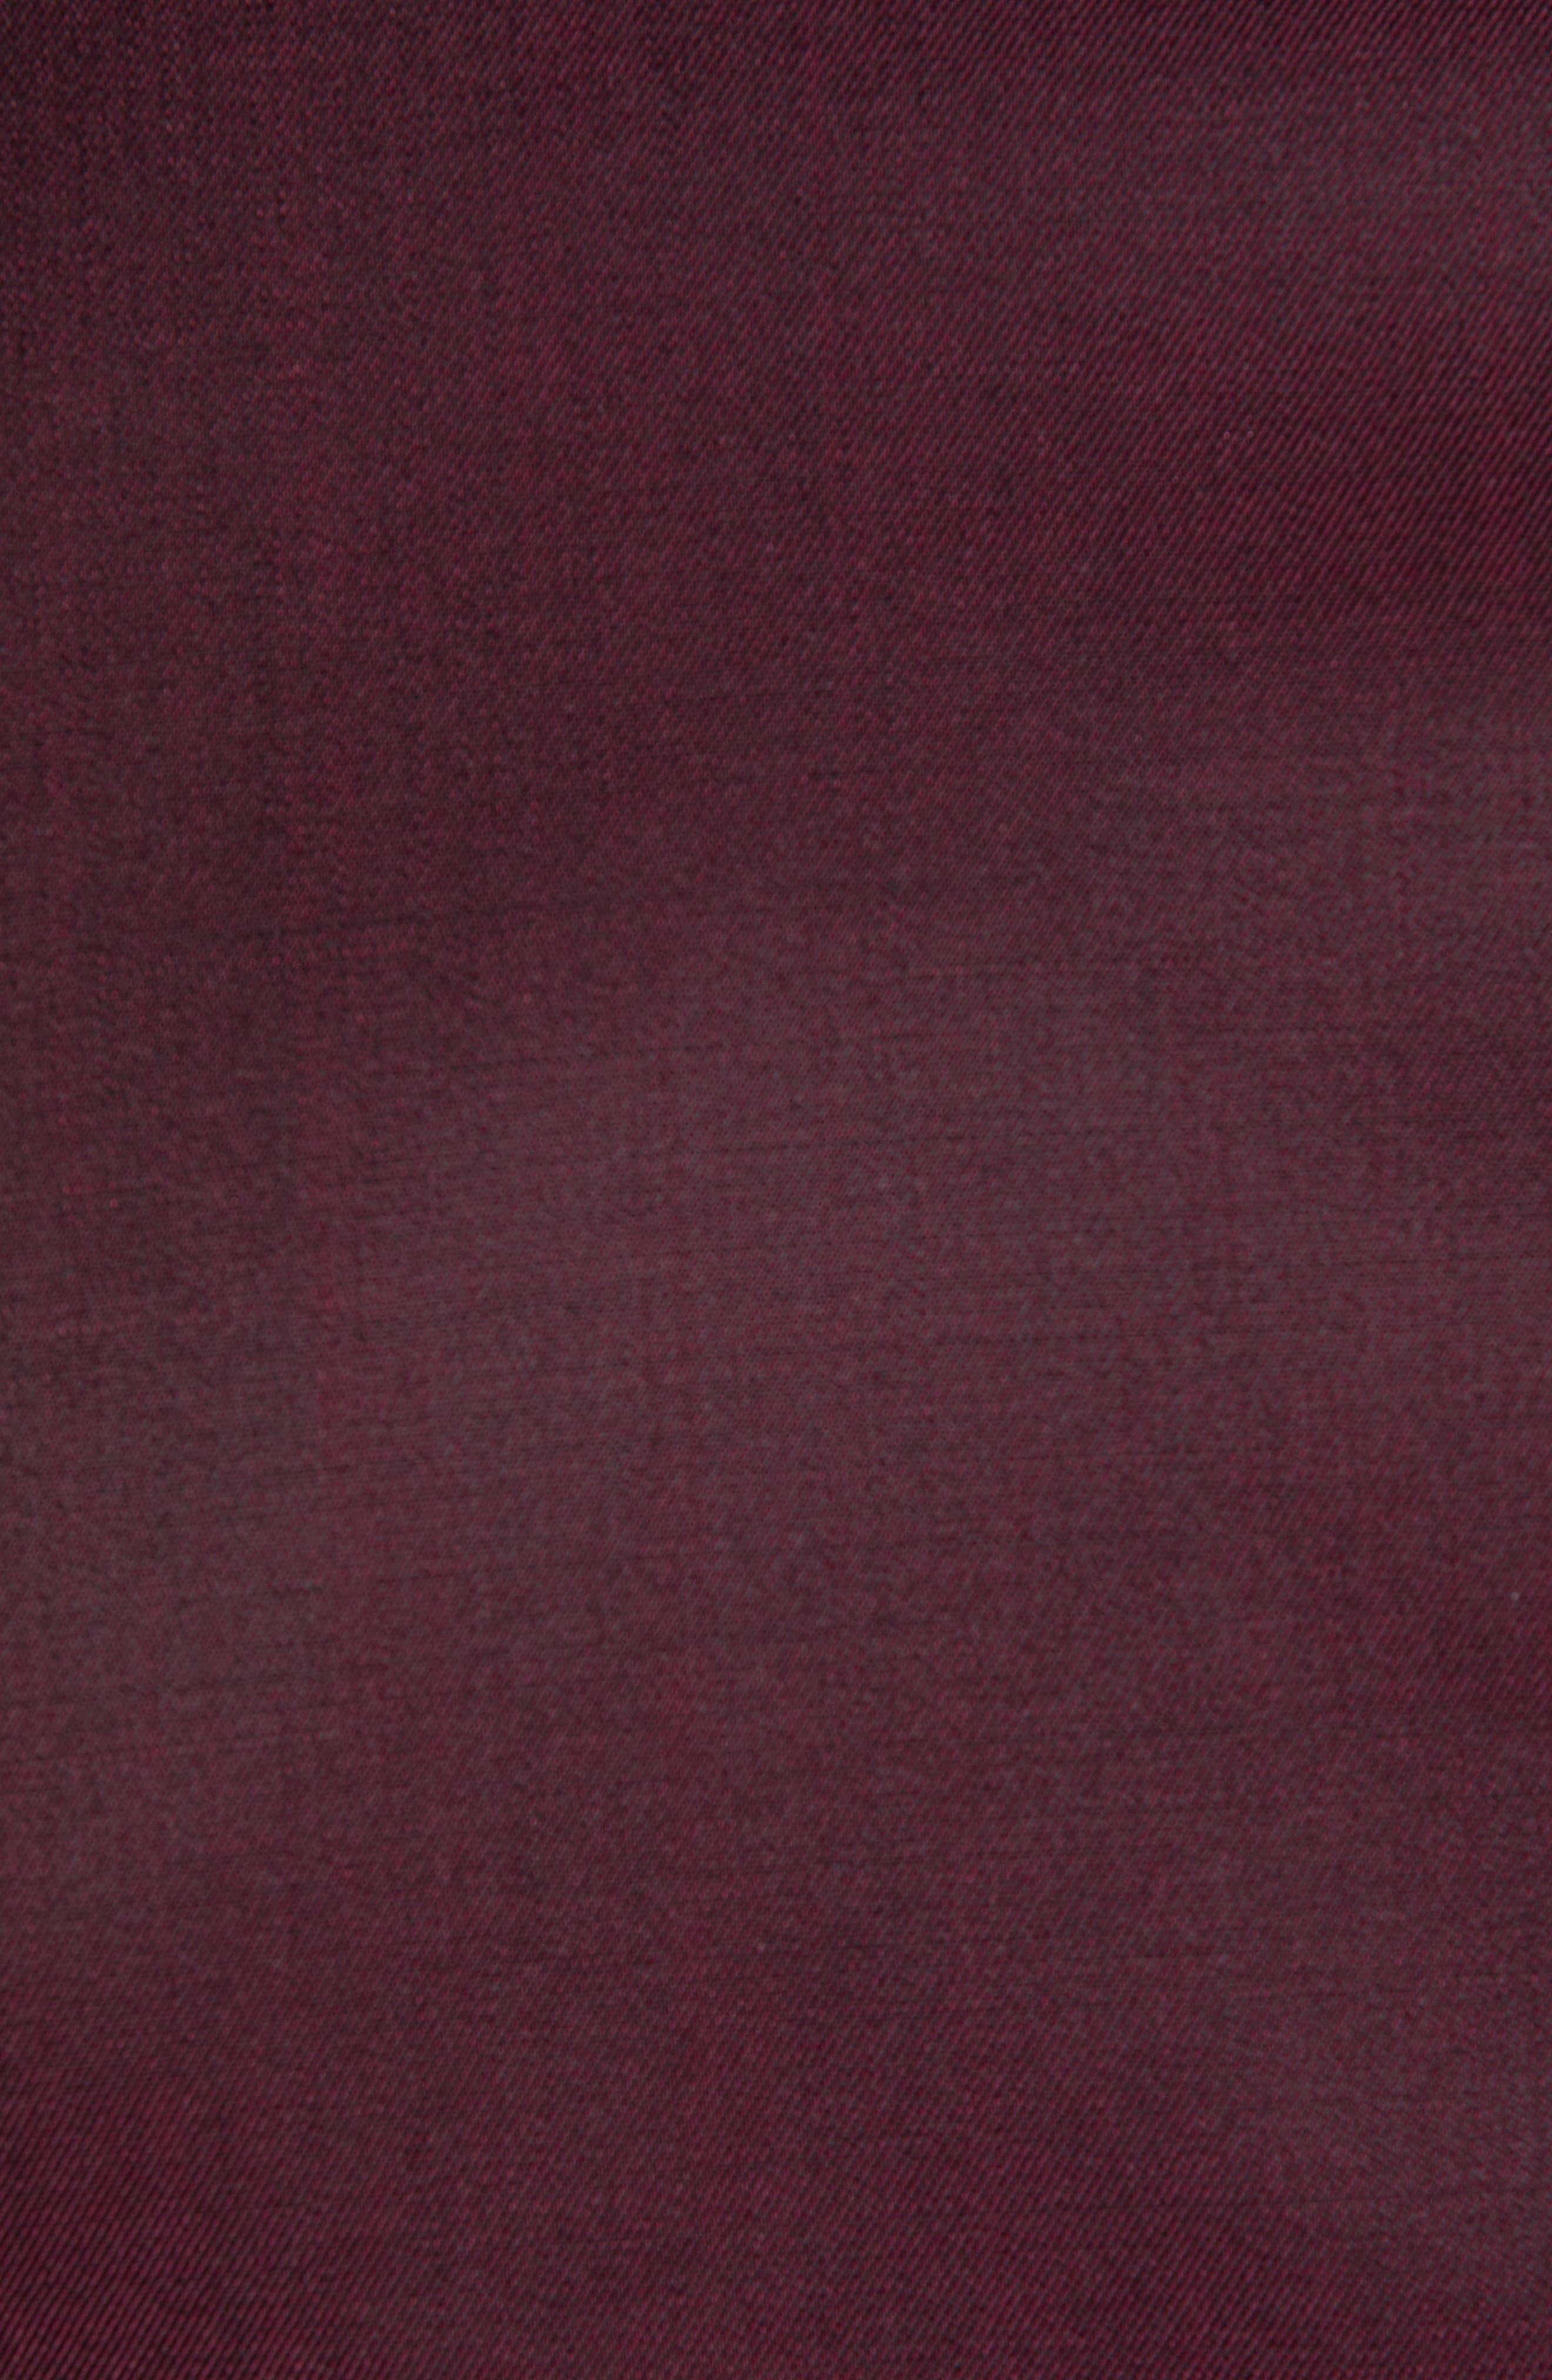 Josh Trim Fit Wool & Mohair Dinner Jacket,                             Alternate thumbnail 6, color,                             BERRY